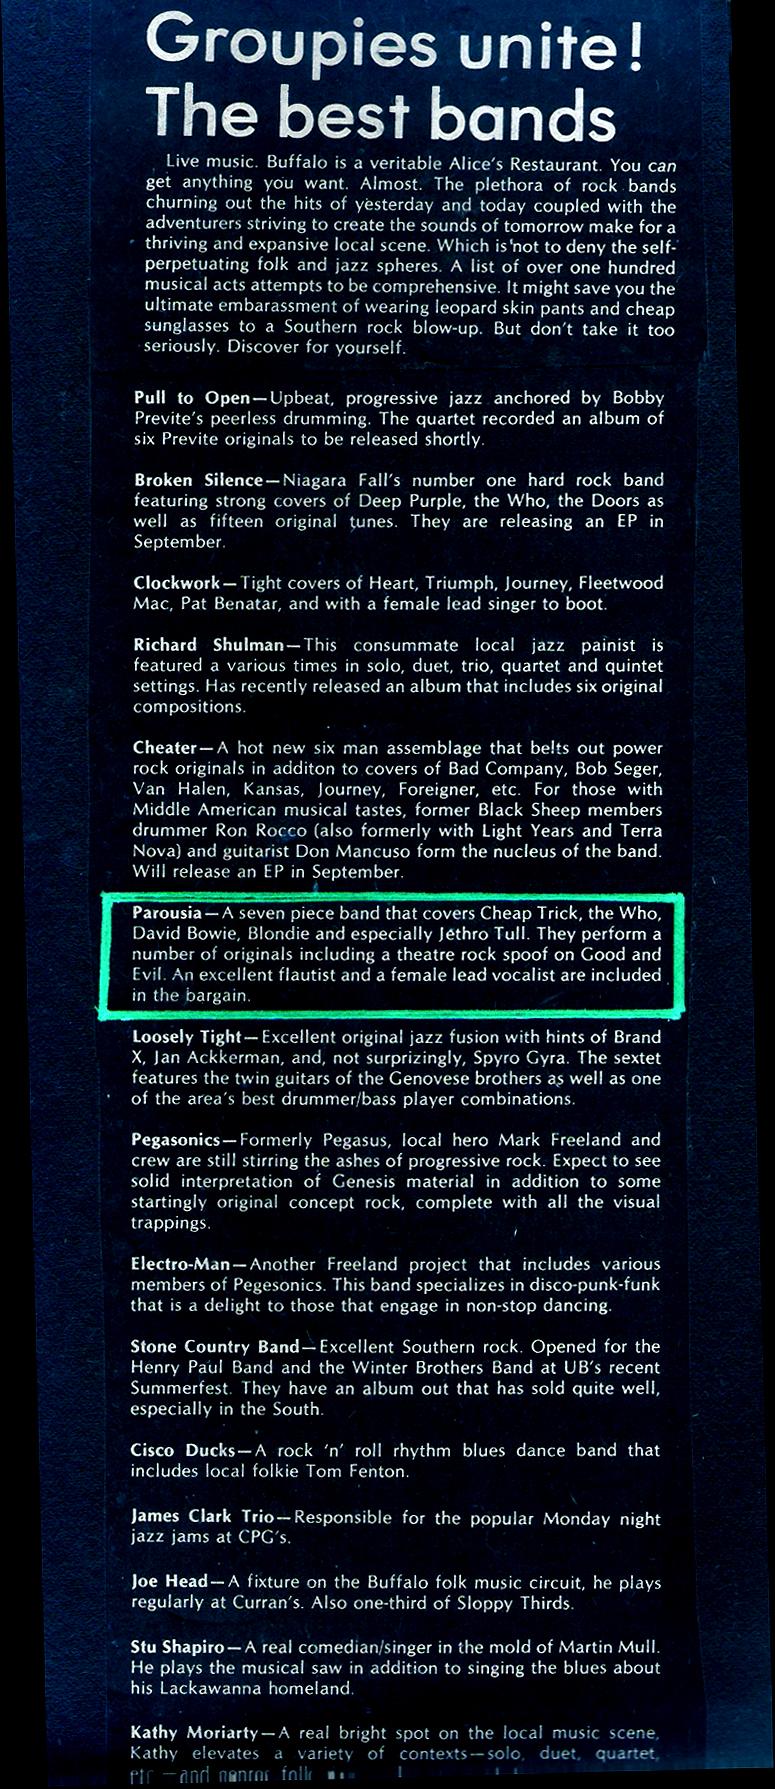 University Of Buffalo's 'Band Survival Guide' Sept.1980